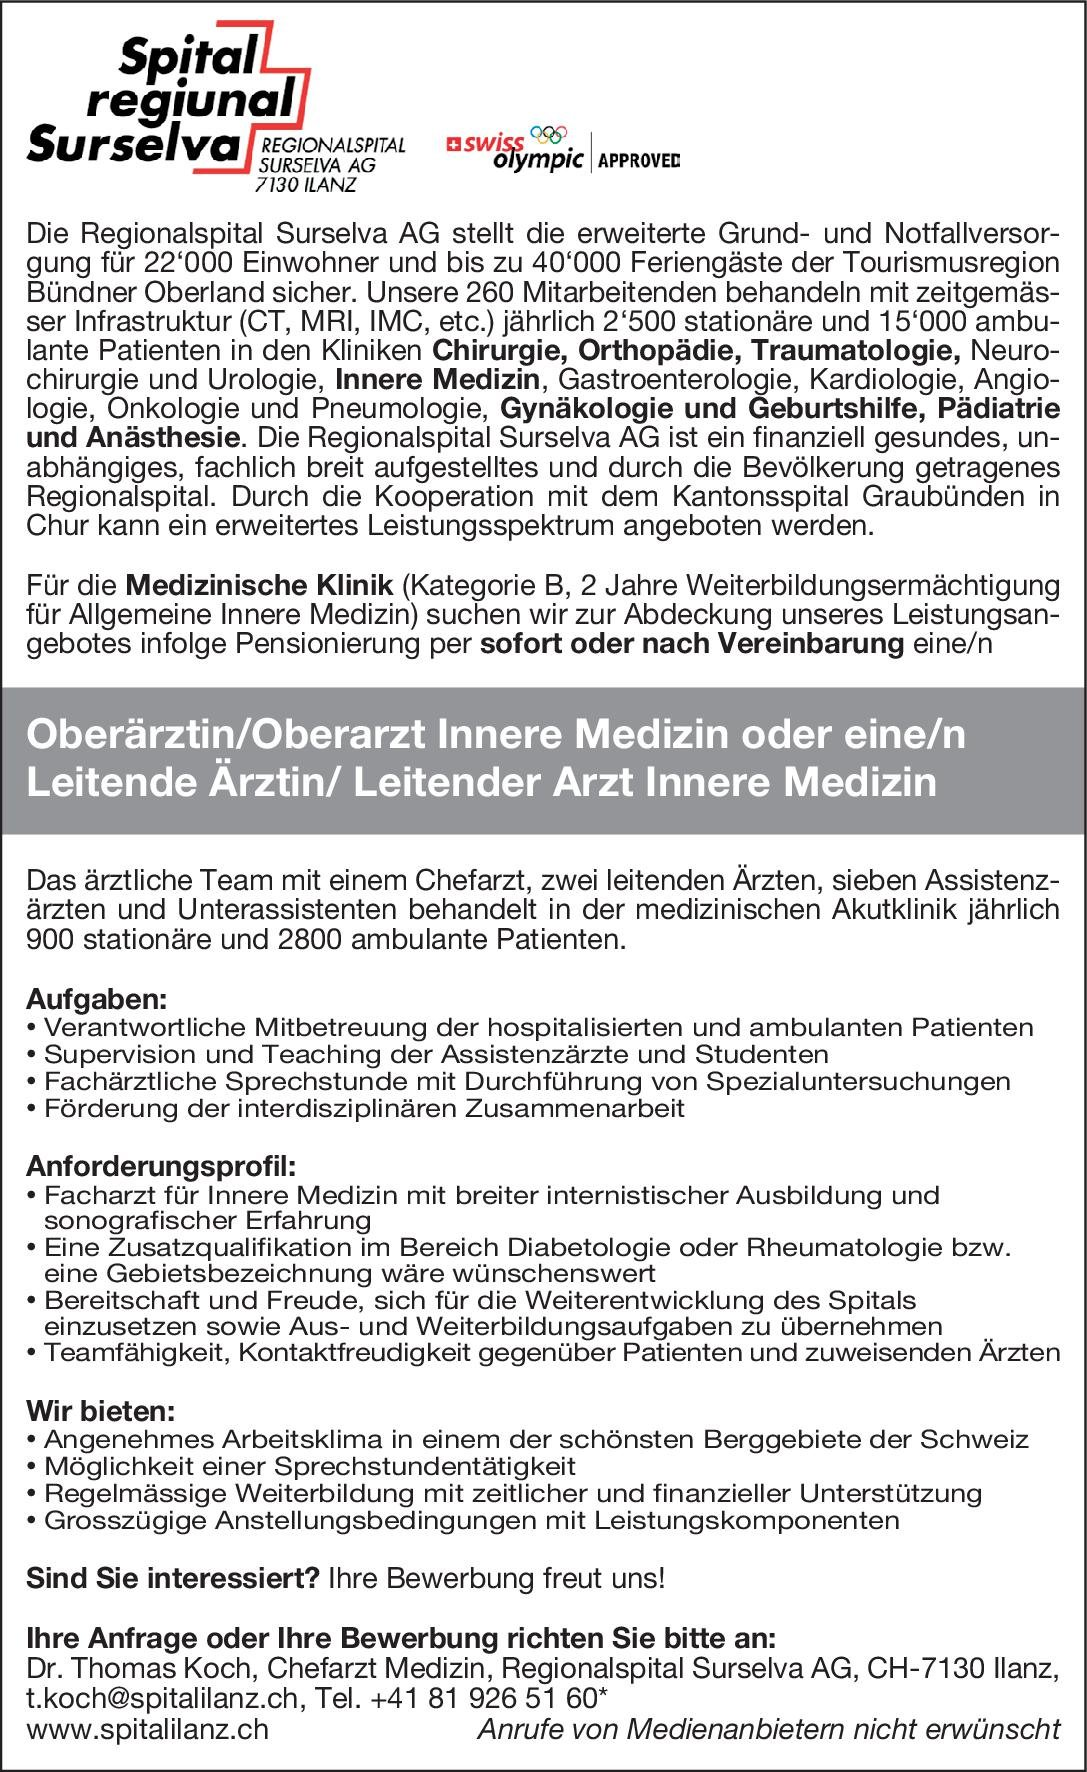 Regionalspital Surselva AG Oberärztin/Oberarzt Innere Medizin oder Leitende Ärztin/ Leitender Arzt Innere Medizin  Innere Medizin, Innere Medizin Ärztl. Leiter, Oberarzt